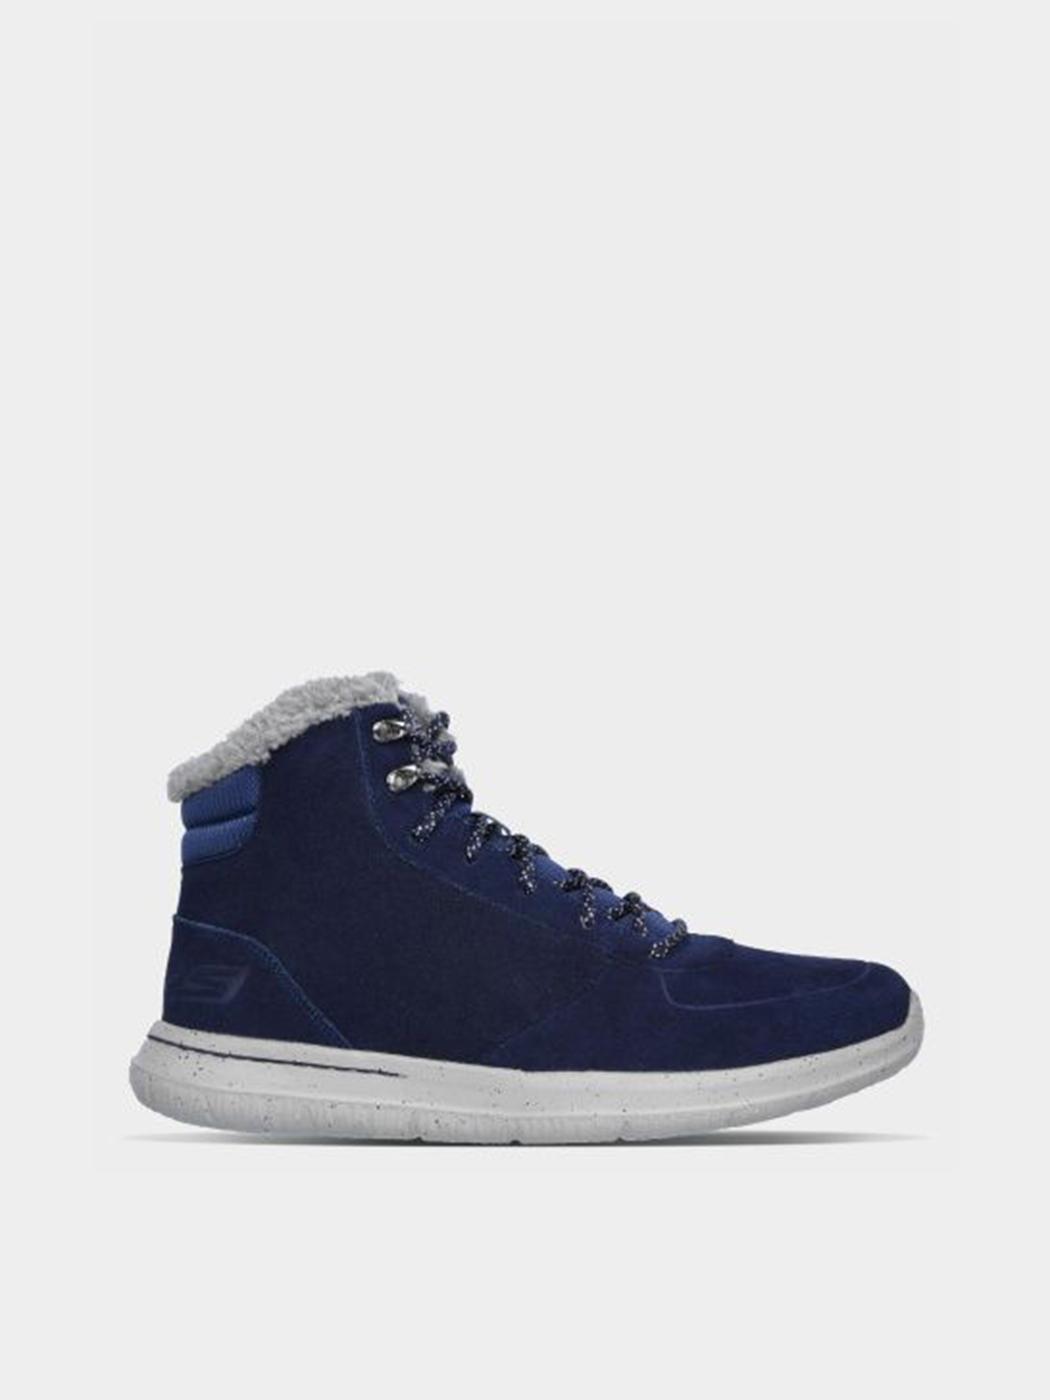 Купить Ботинки мужские Skechers KM2506, Синий